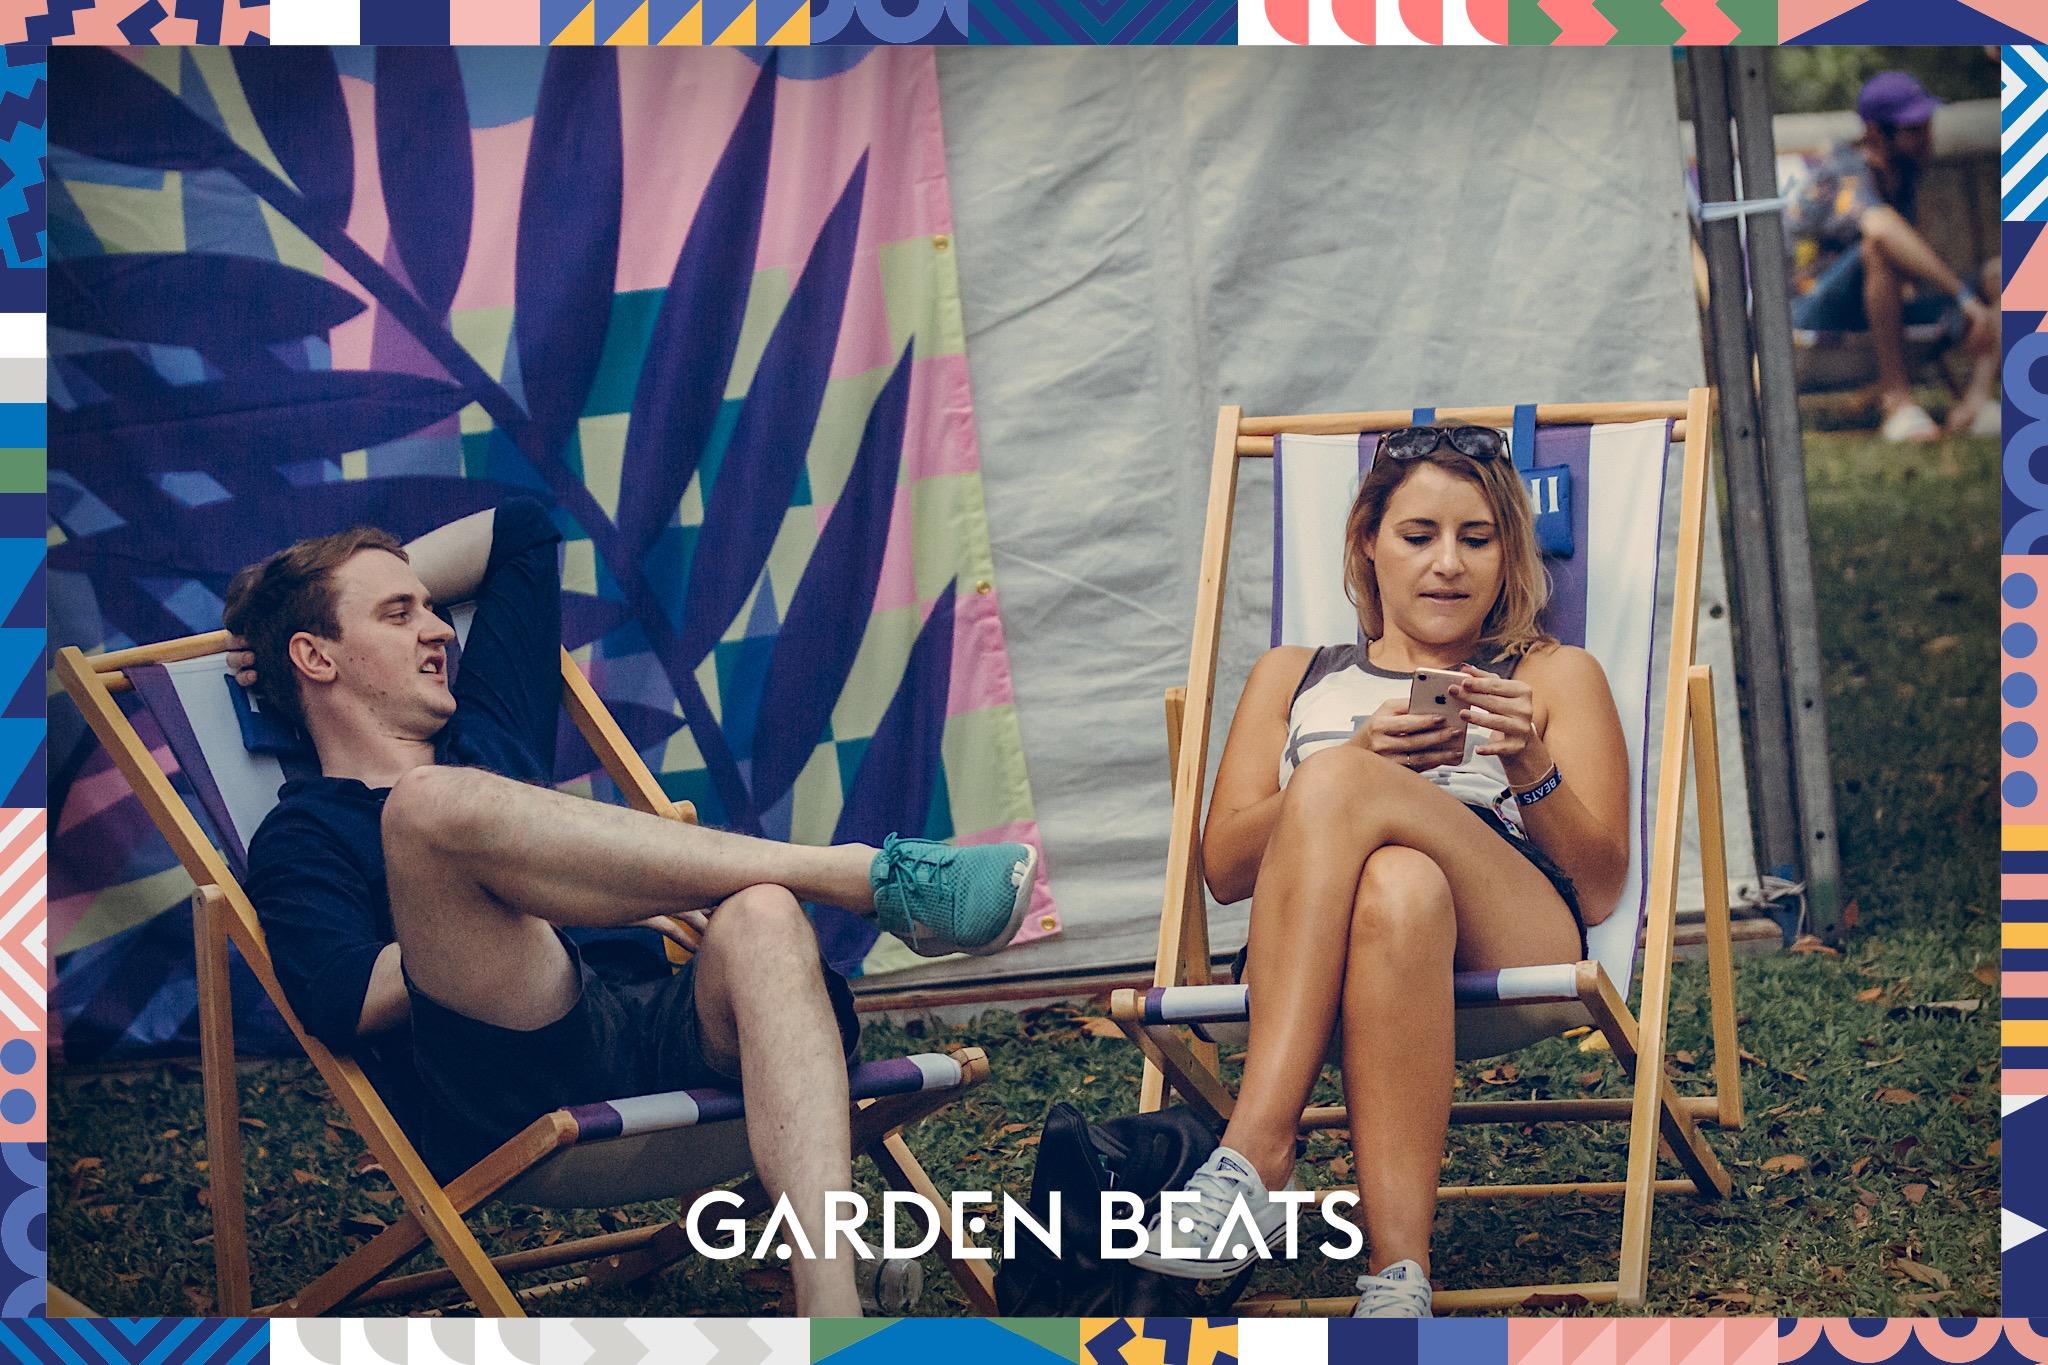 03032018_GardenBeats_Colossal452_Watermarked.jpg